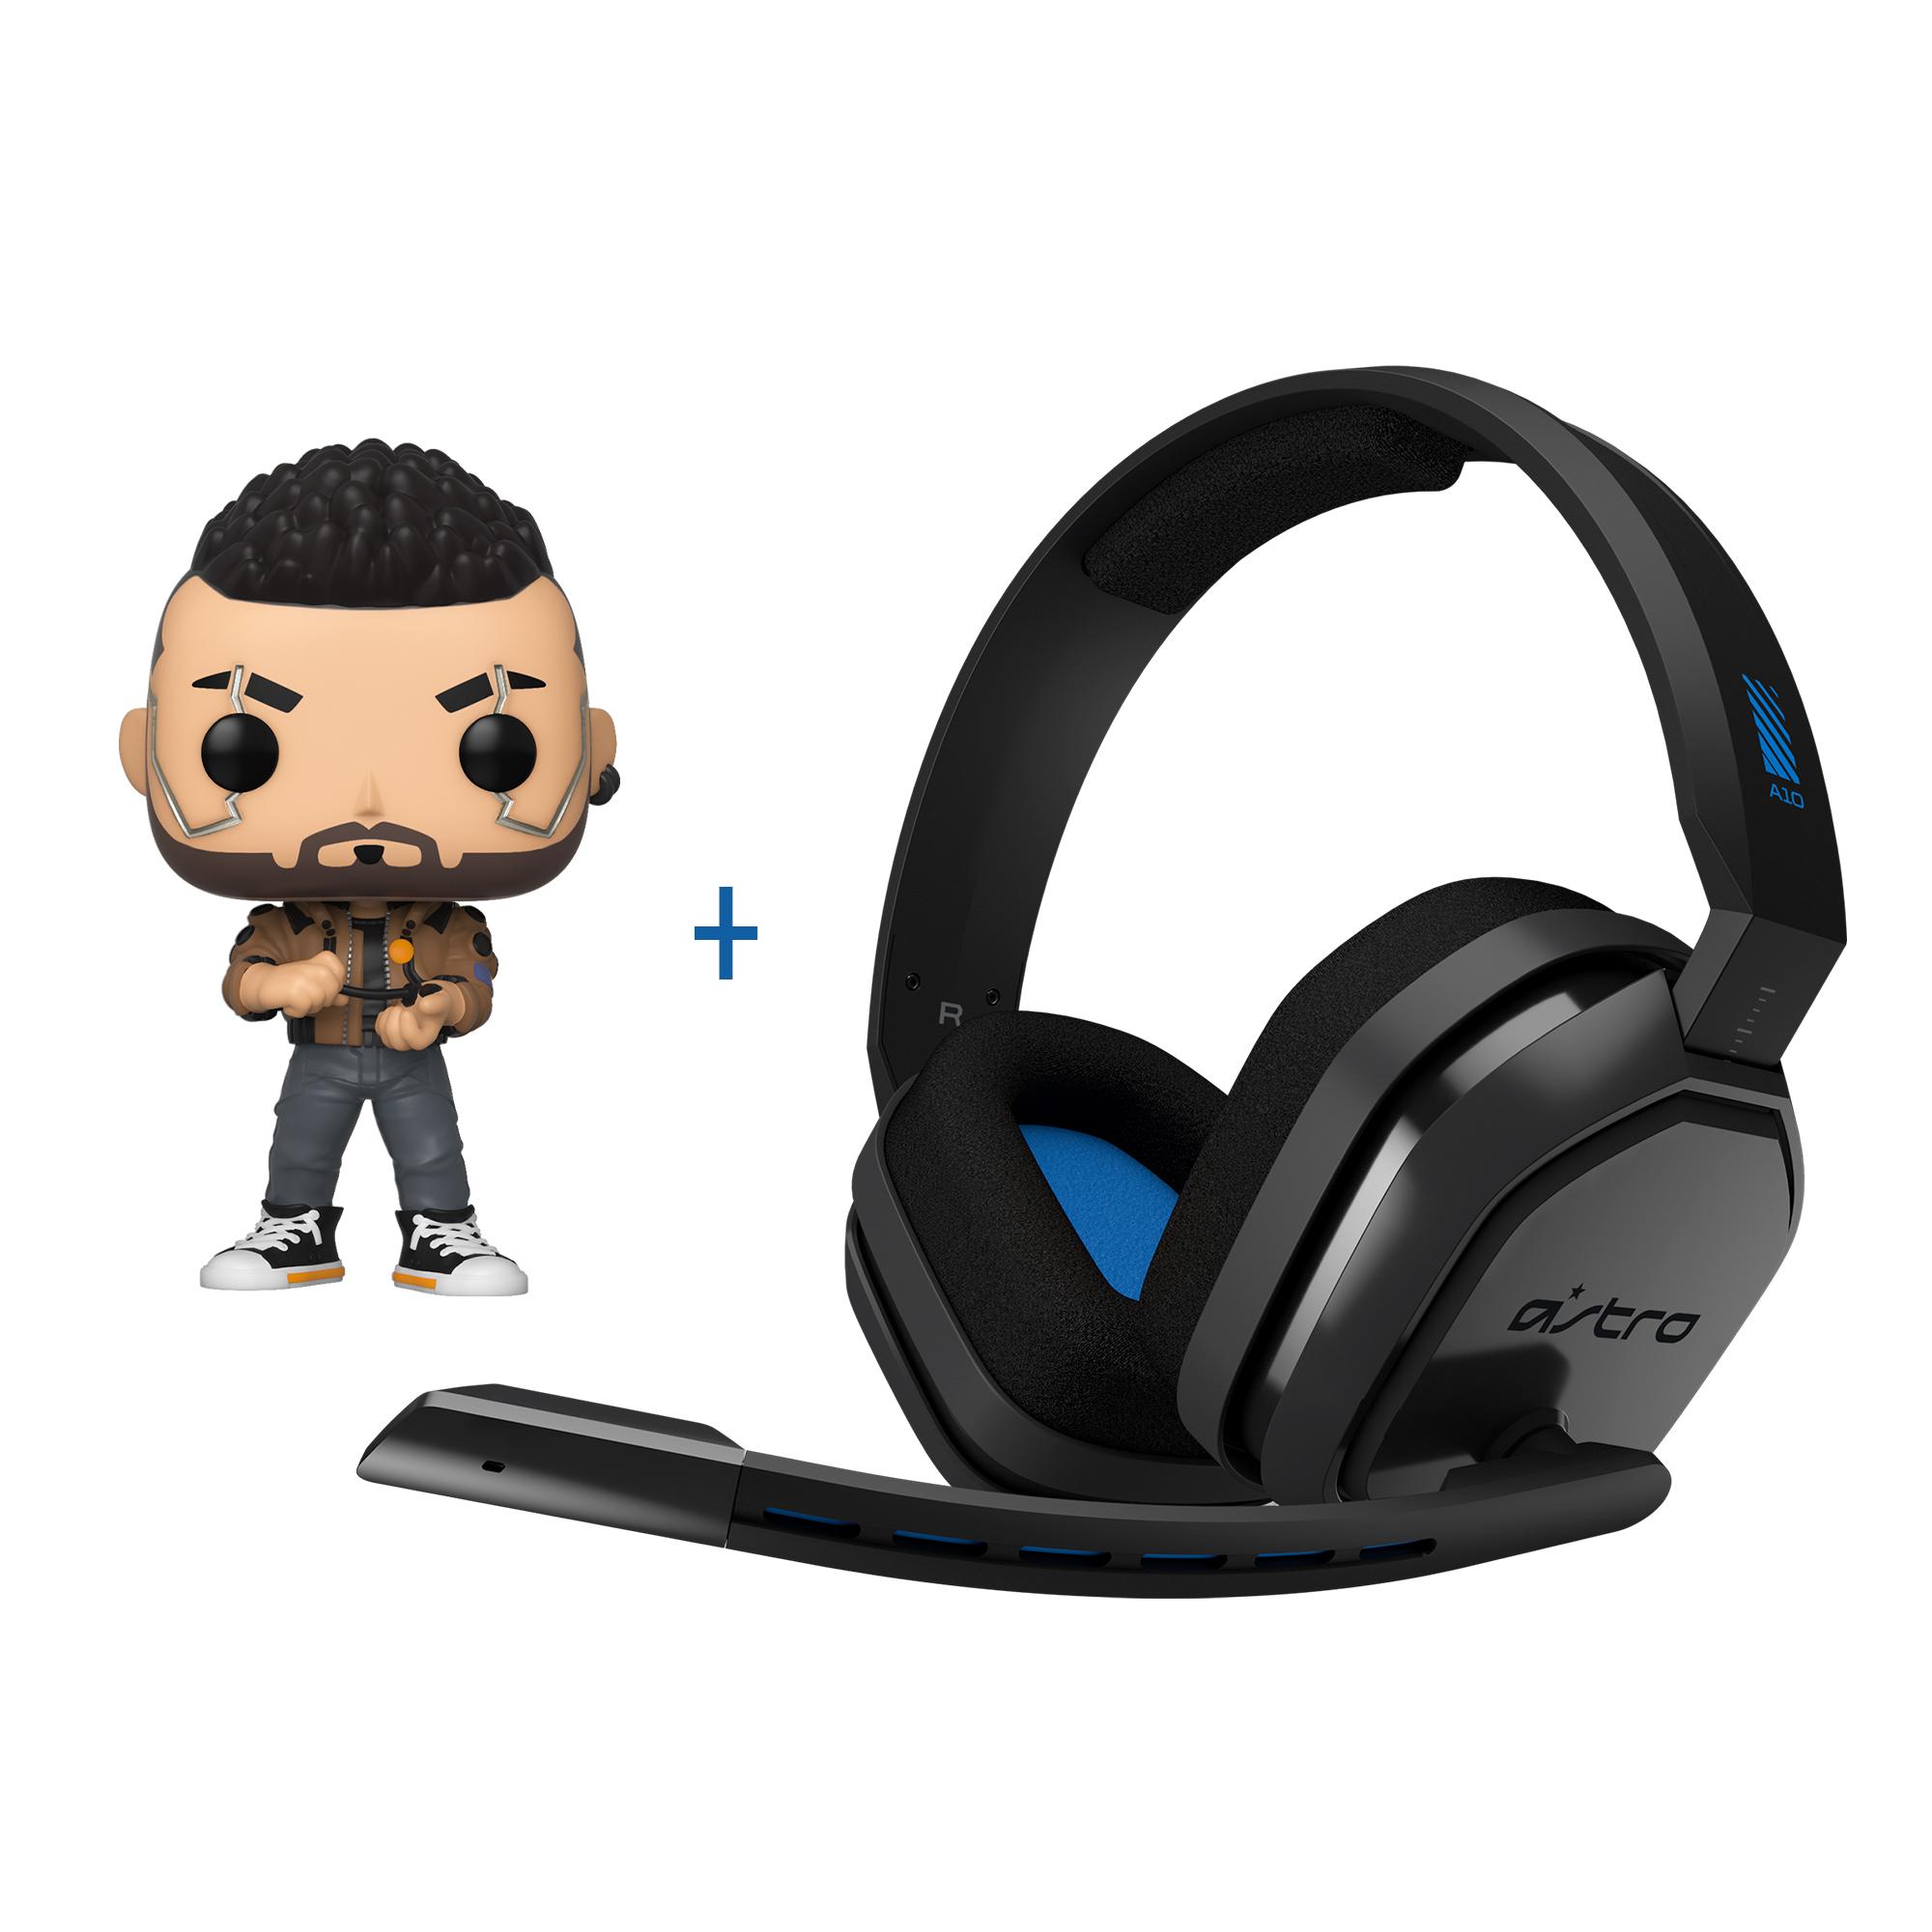 Astro - A10 Gaming Headset PS4+PC Grey/Blue + Funko! POP Cyberpunk 2077 -V-Male (47159) - Bundle